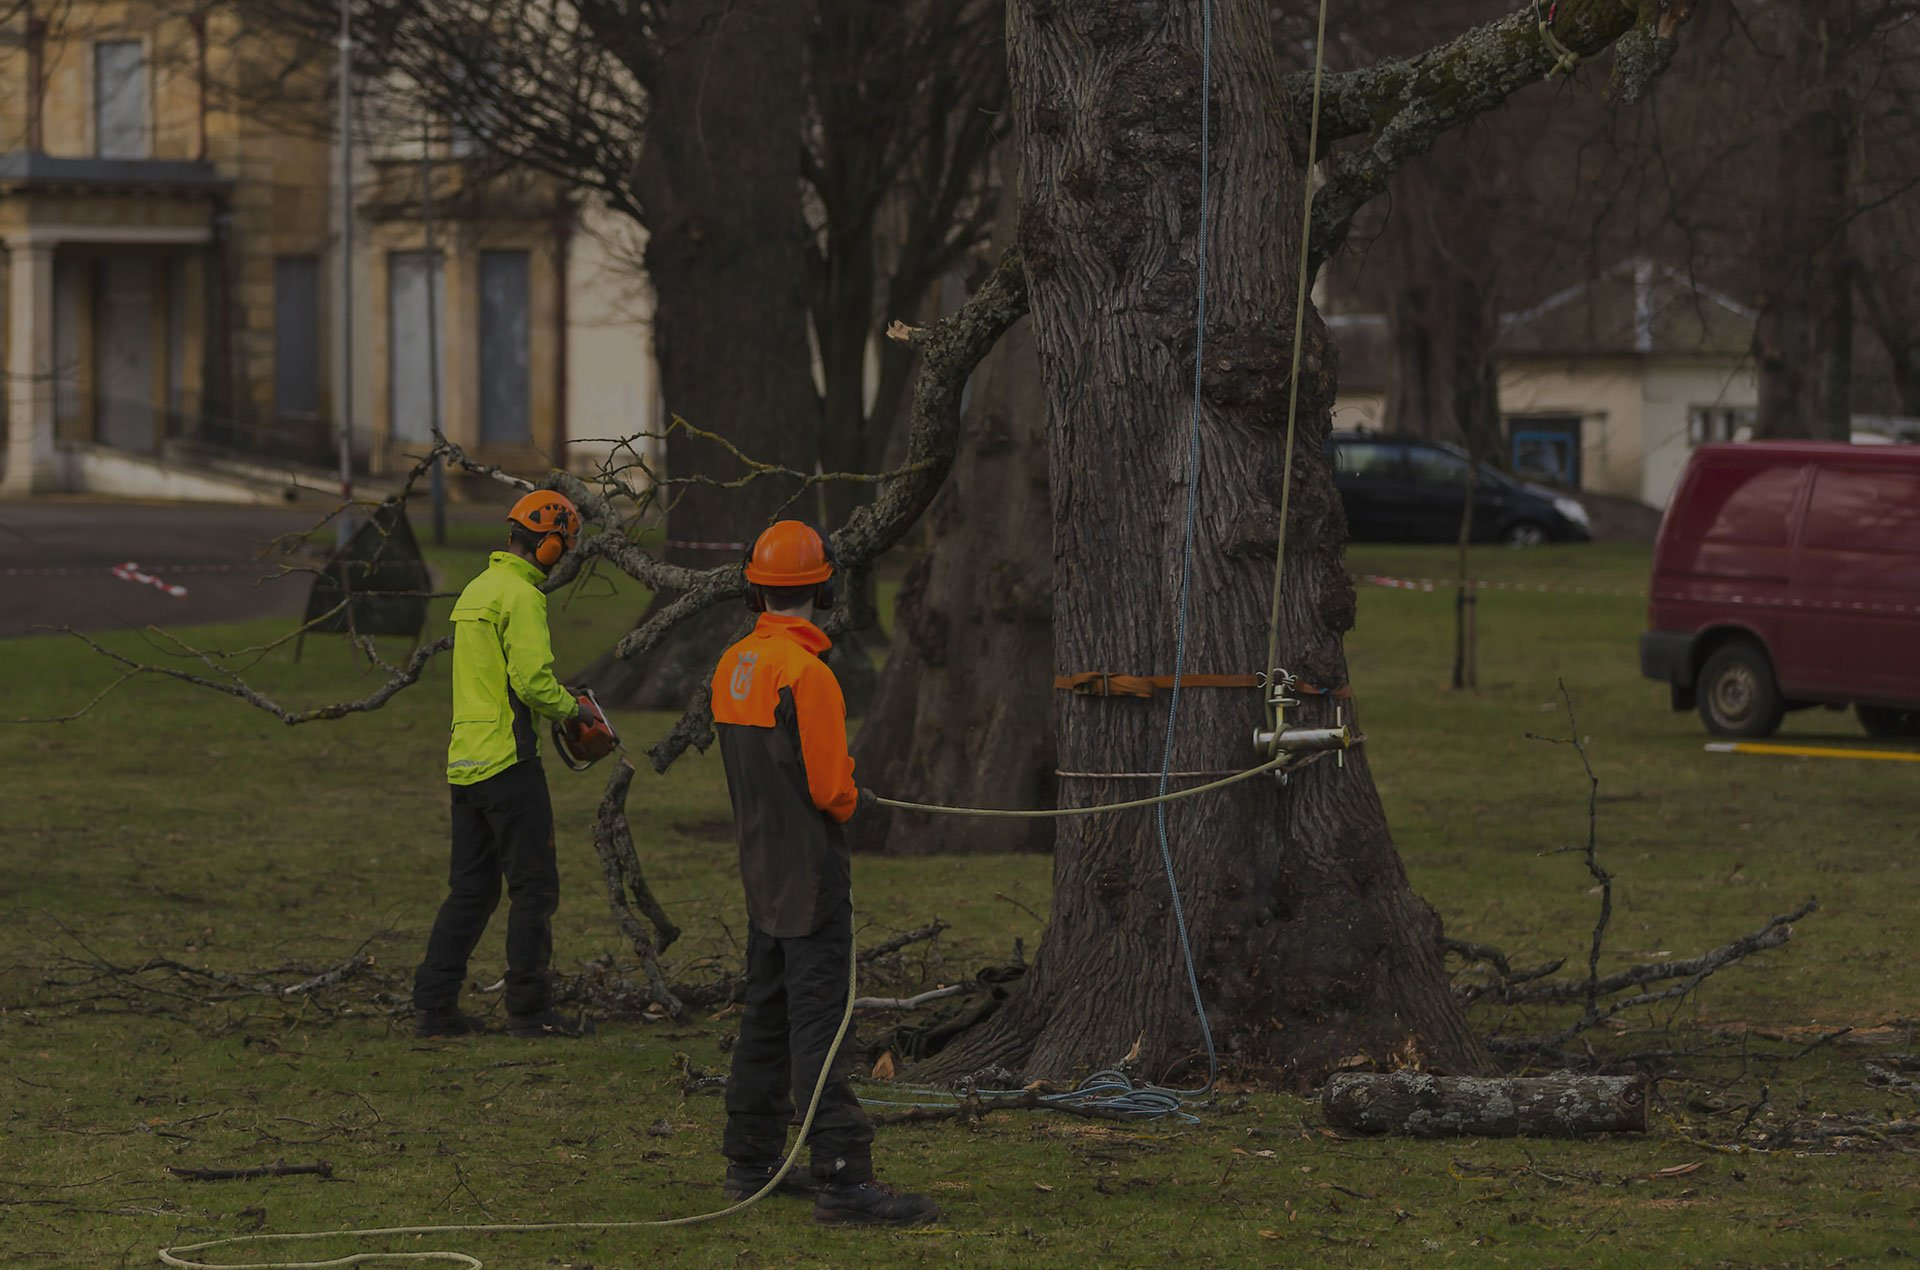 Tree Service Stamford, CT